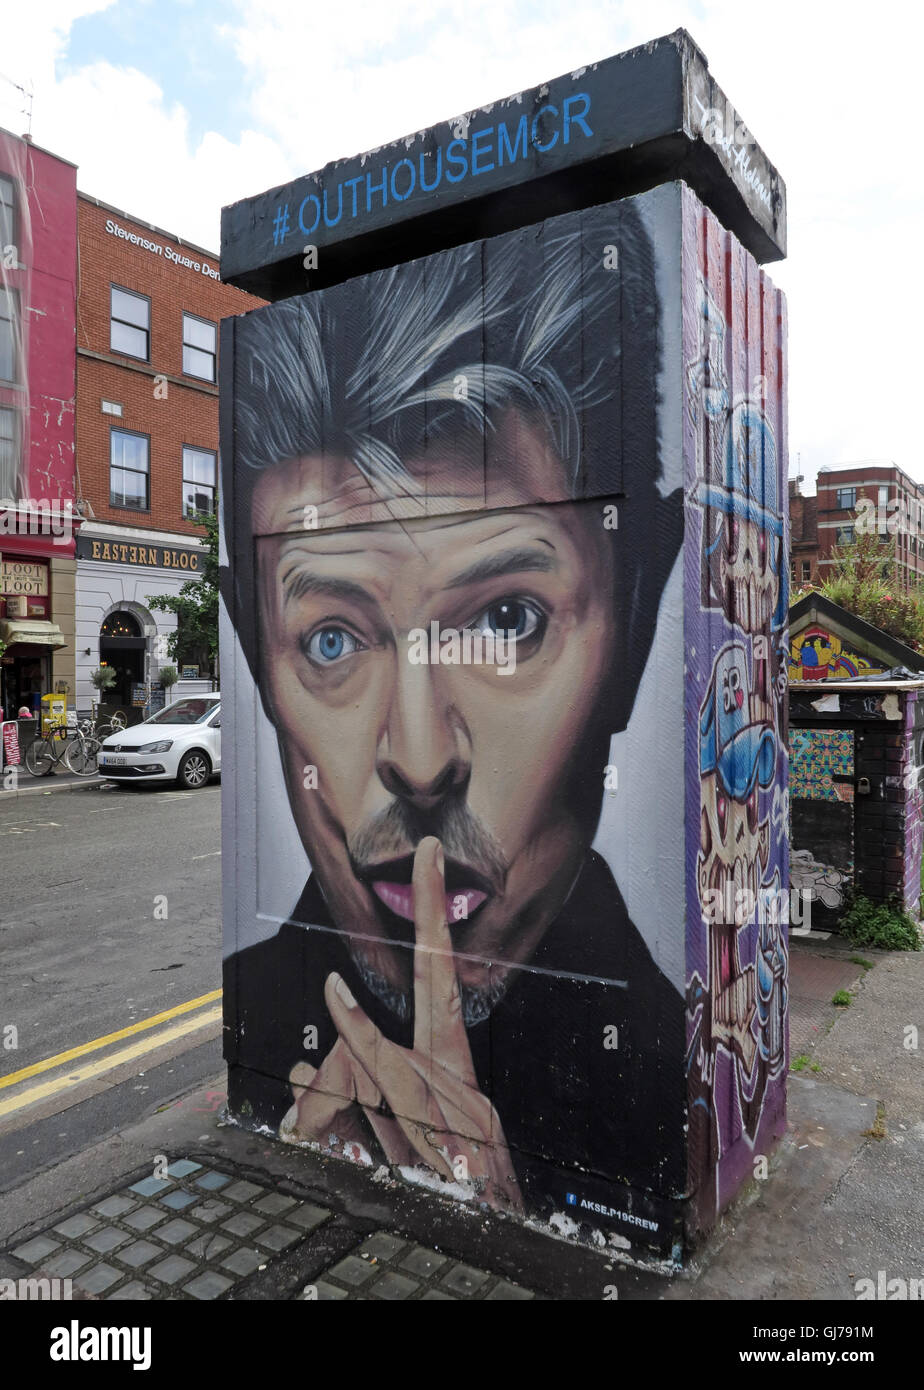 Laden Sie dieses Alamy Stockfoto Northern Quarter Kunst in Stevenson Square Manchester, UK-Wand Graffiti August 2016 von AKSE OUTHOUSEMCR - GJ791M